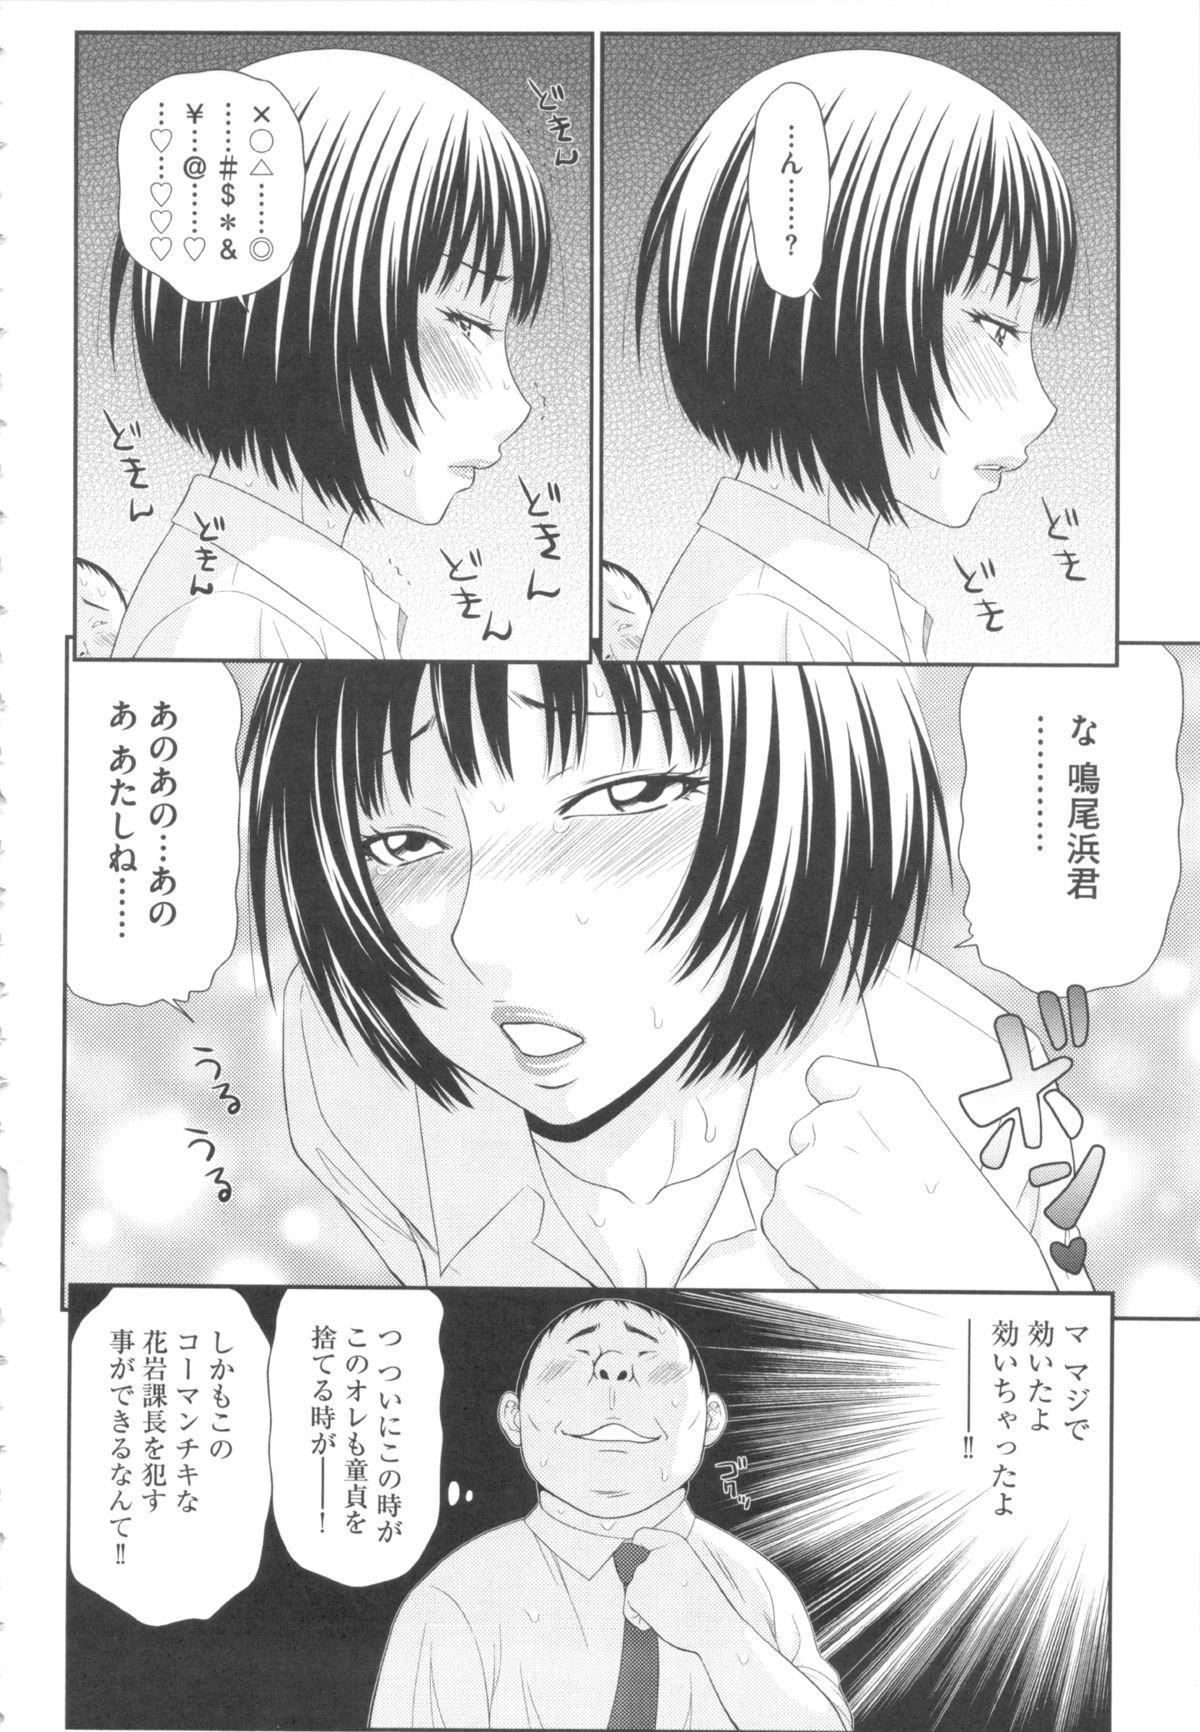 Kiseki No Zaajiru - Sperm of Miracle 12